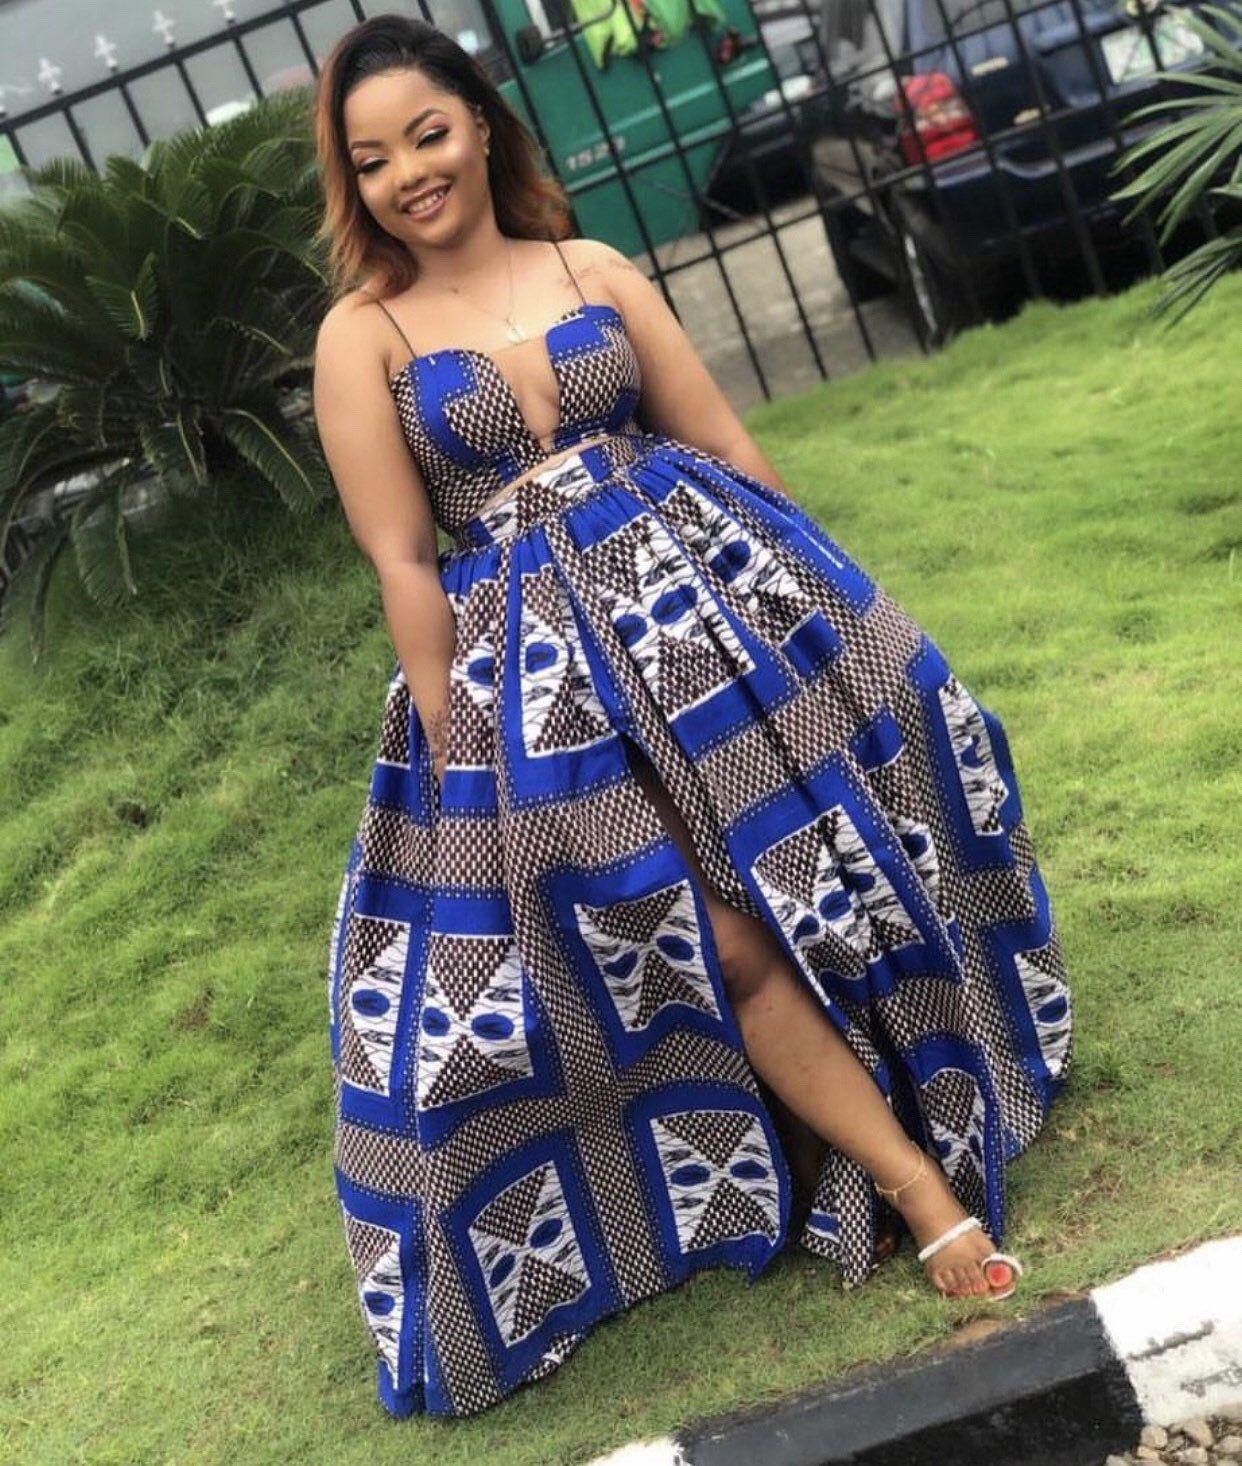 Ankara Dress Kitenge Dress 2 Piece Crop Top And Maxi Skirt Dress Latest African Fashion Dresses African Maxi Dresses African Design Dresses [ 1466 x 1242 Pixel ]